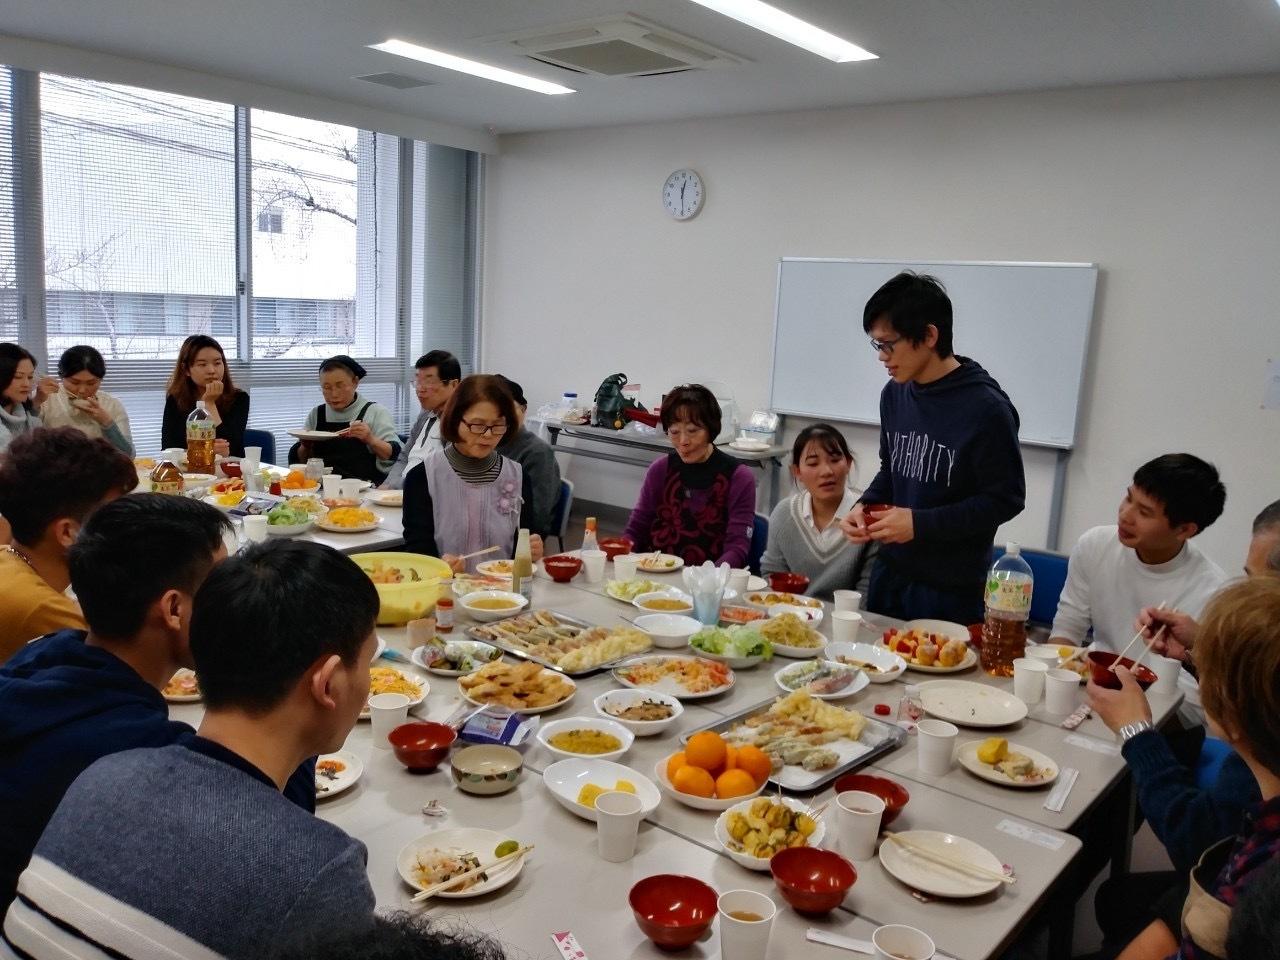 私の国の料理ー火曜夜教室_e0175020_15572738.jpg